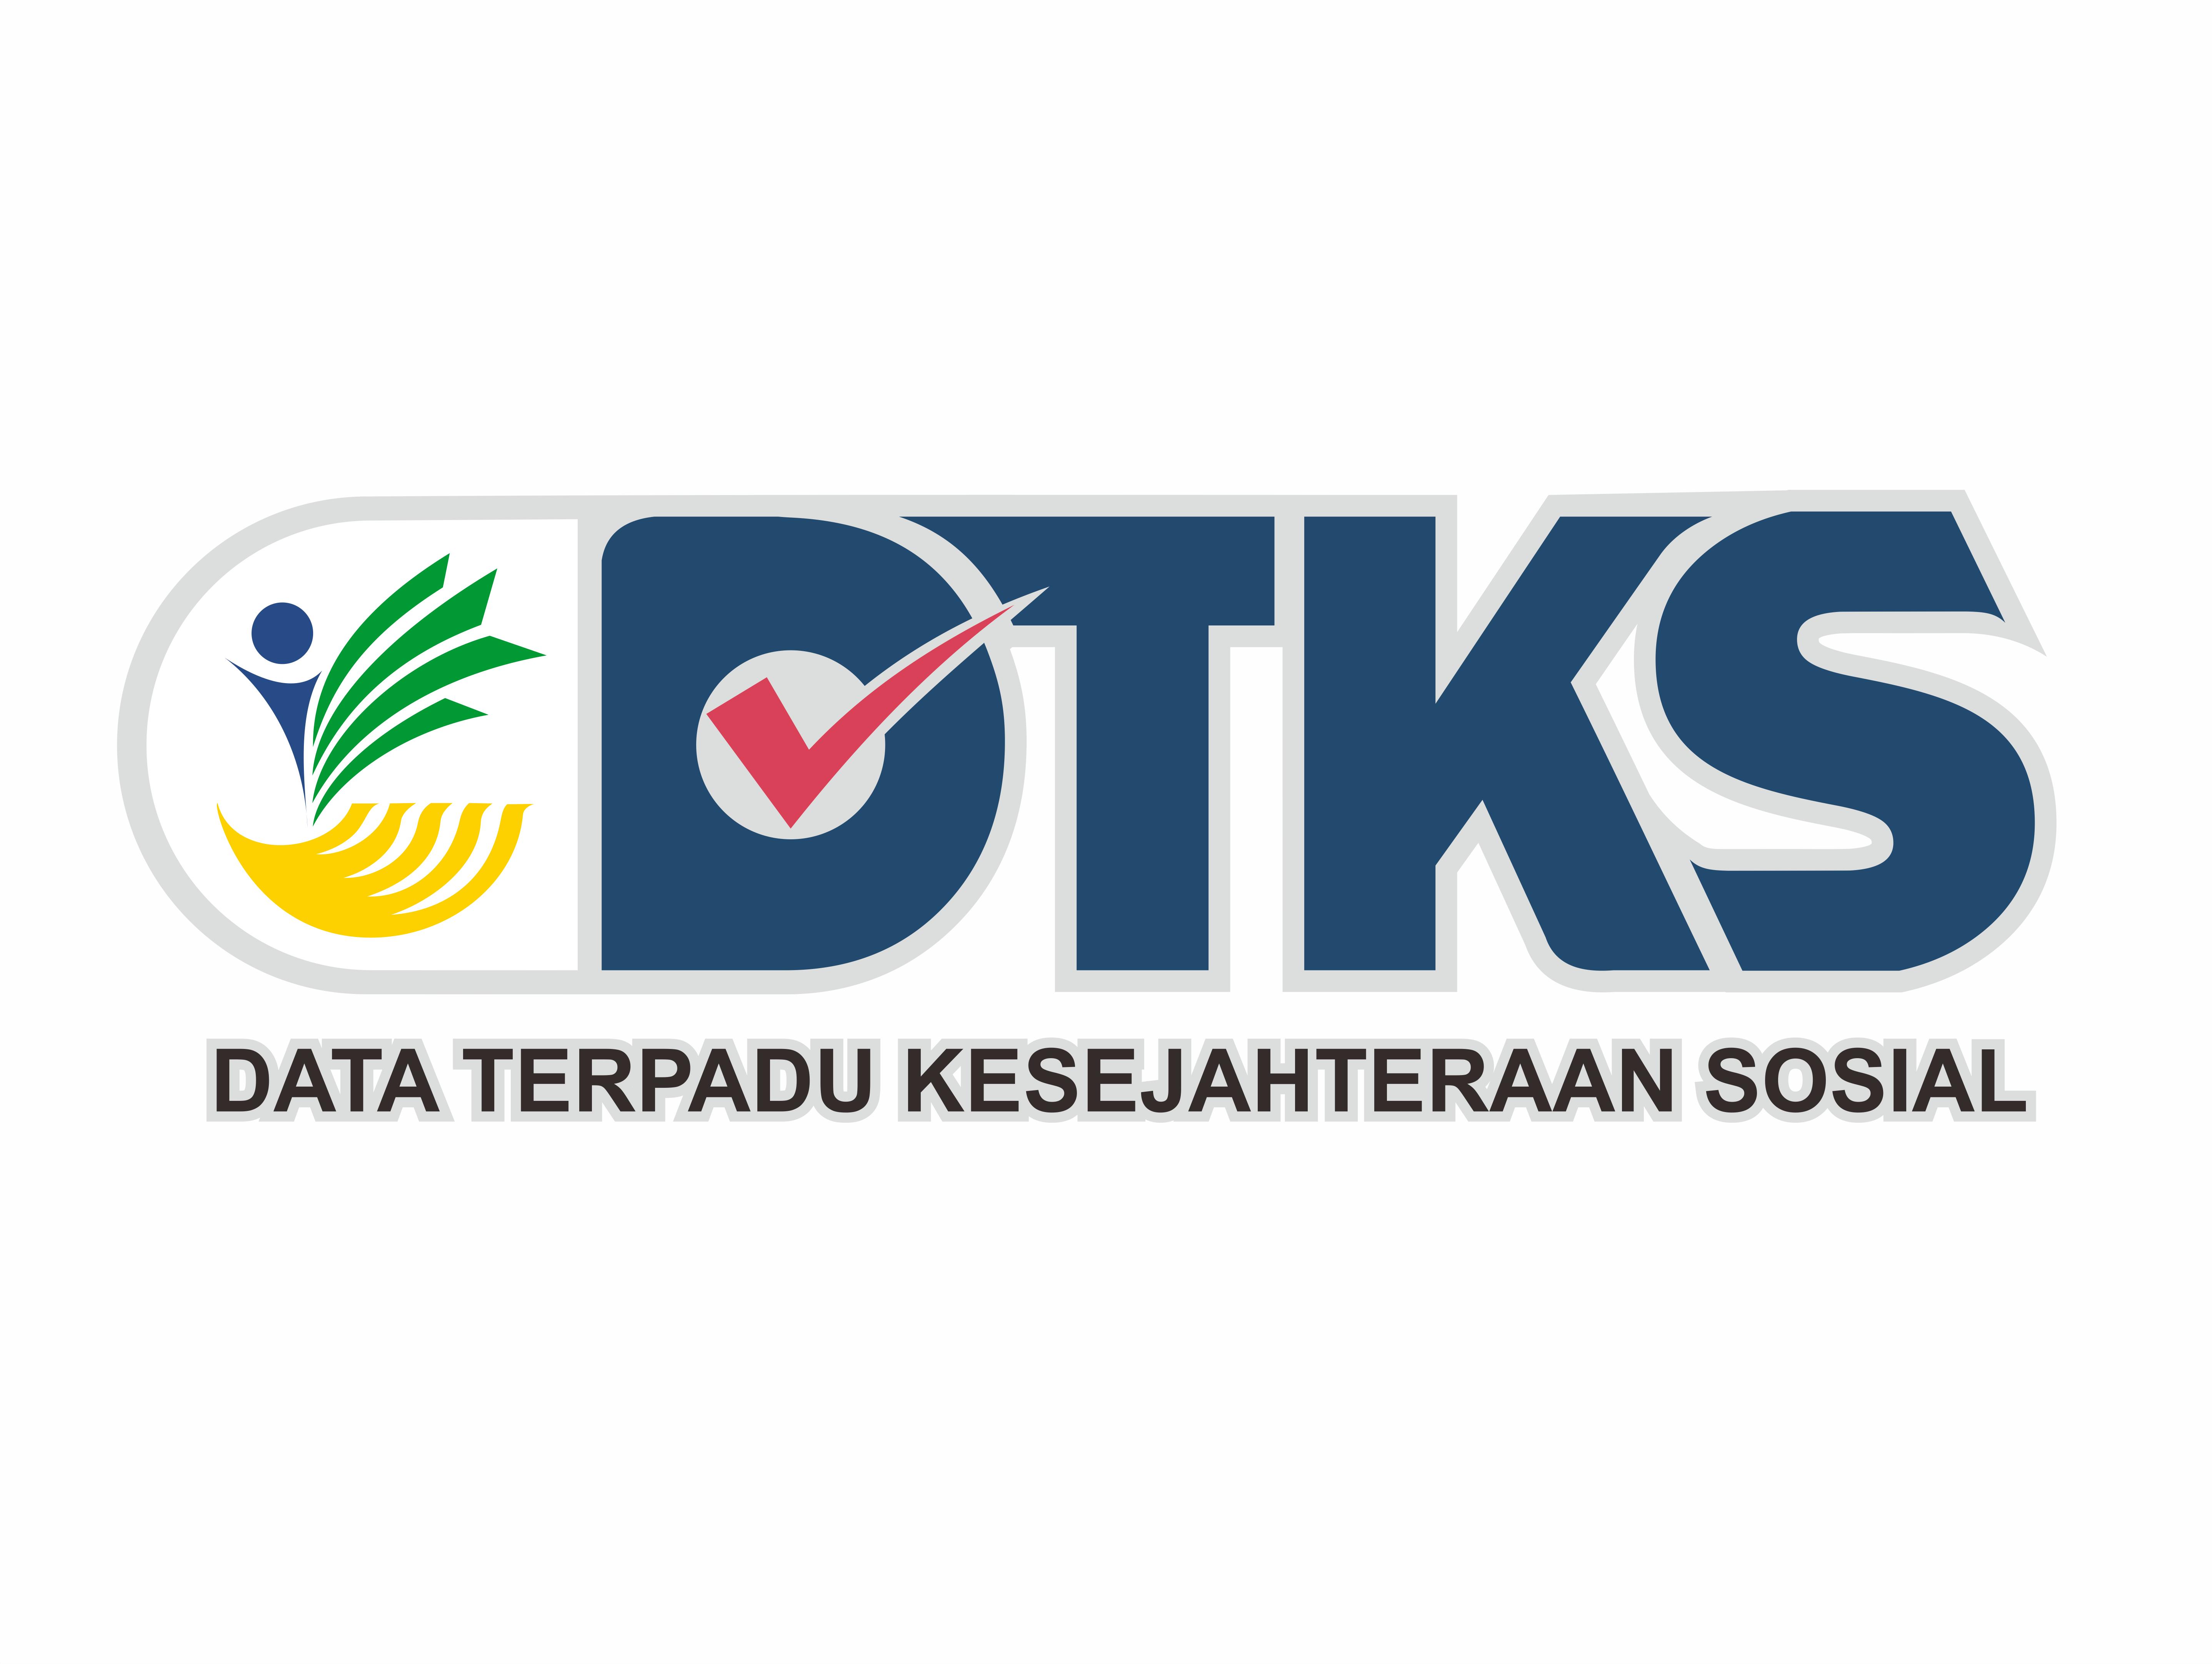 Logo Data Terpadu Kesejahteraan Sosial (DTKS)